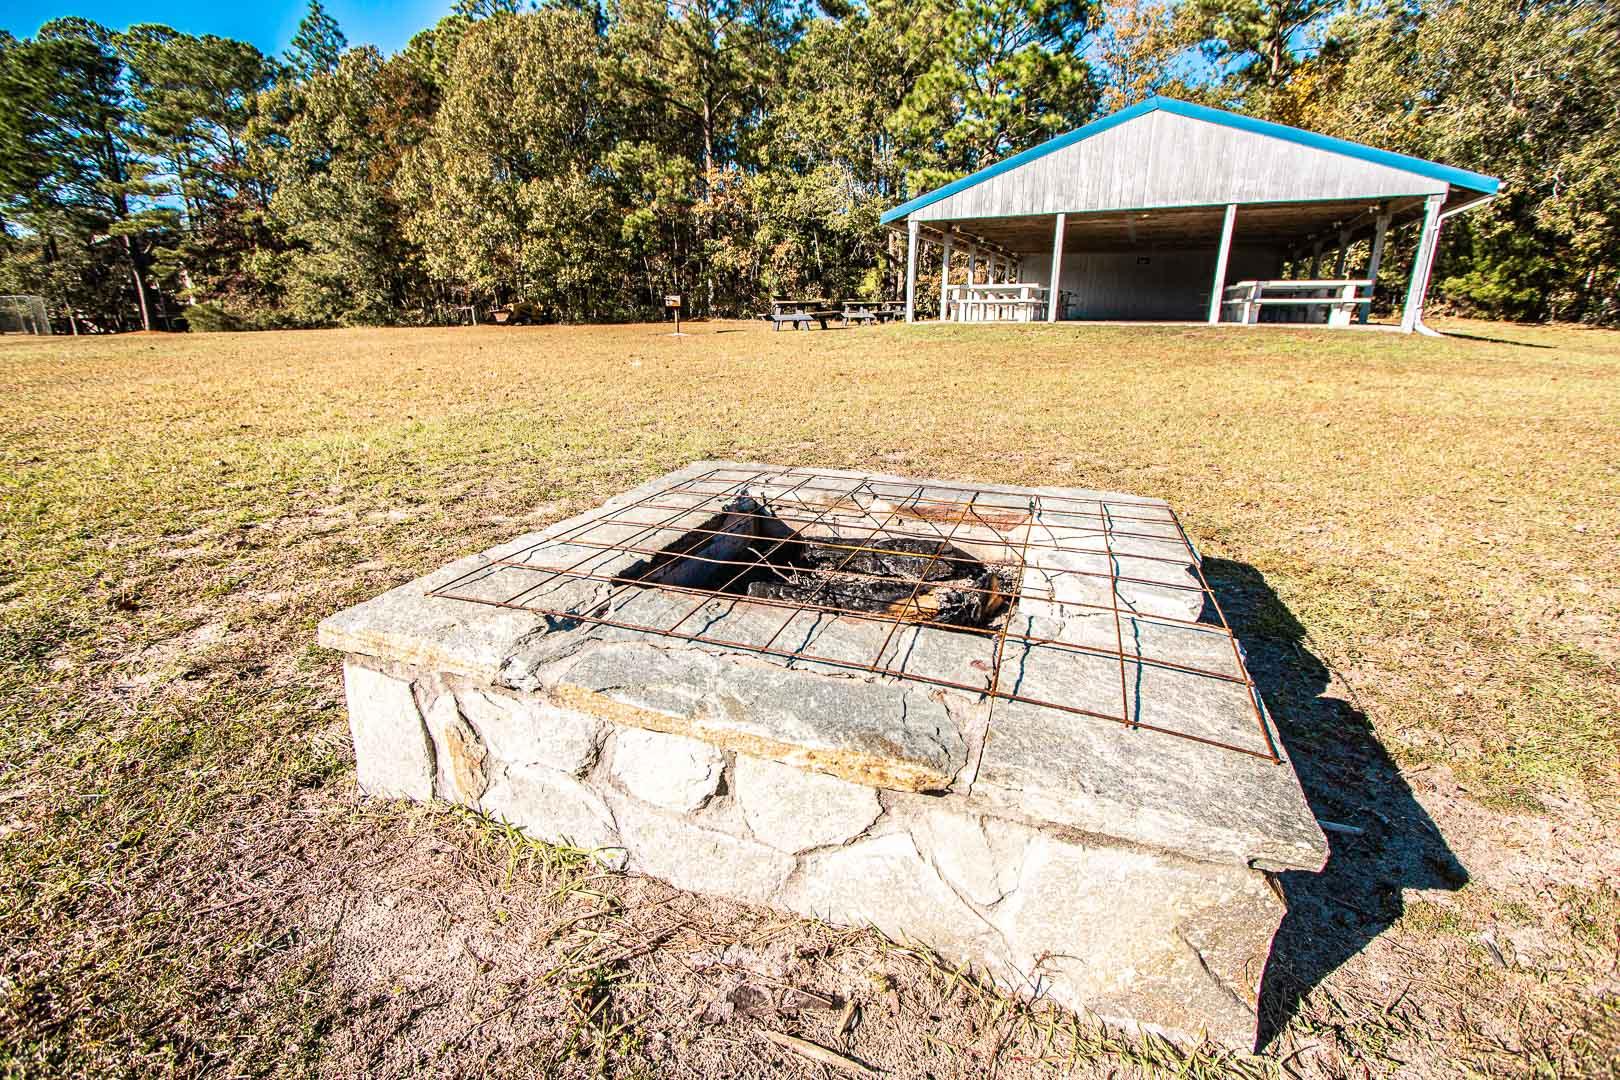 Outdoor bomb fire pit at VRI's Sandcastle Village in New Bern, North Carolina.